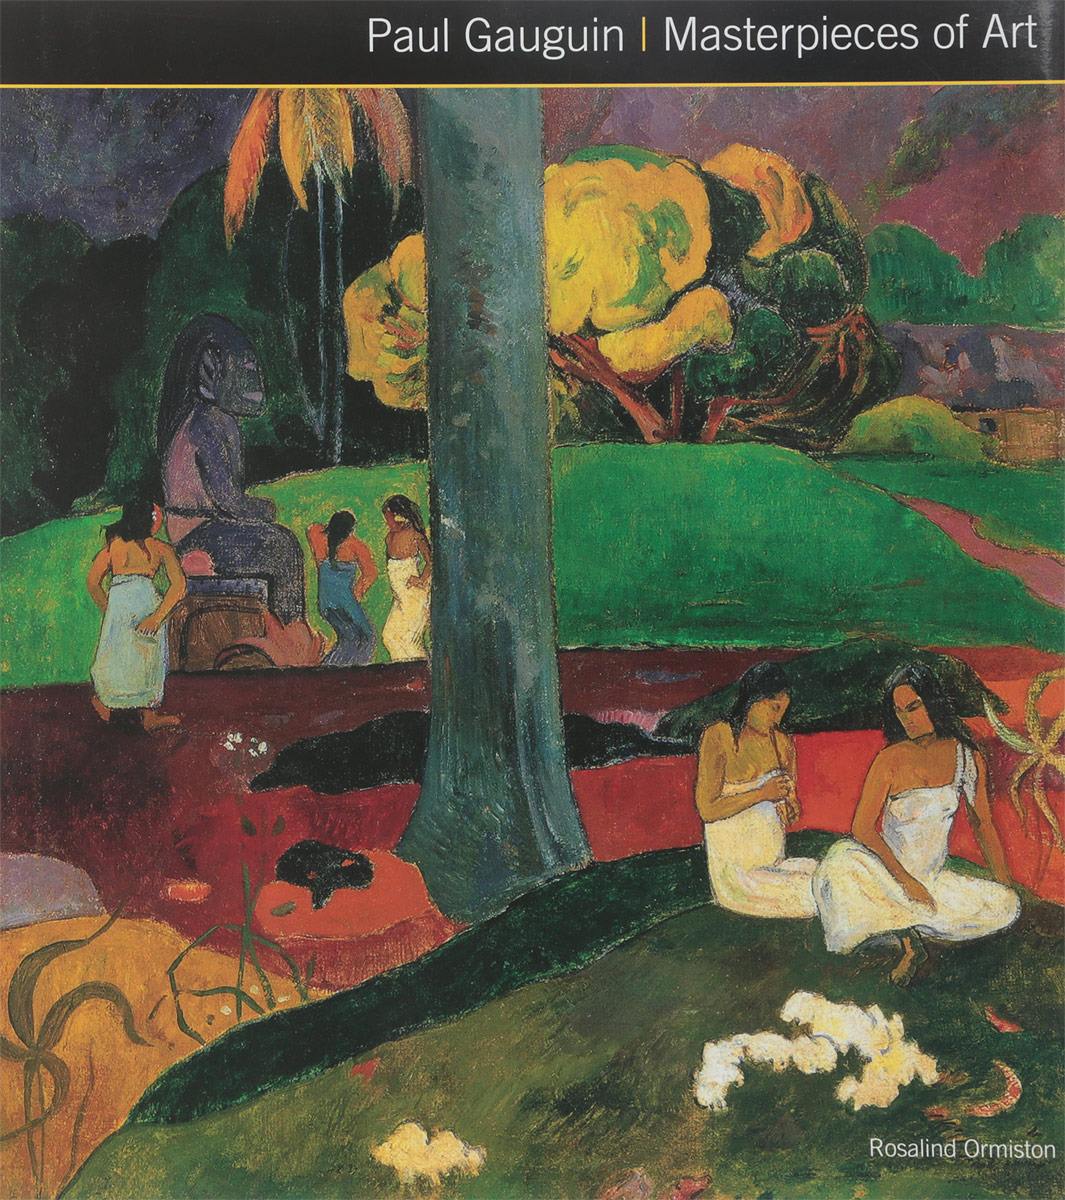 Paul Gauguin / Masterpieces of Art 1000 masterpieces of decorative art